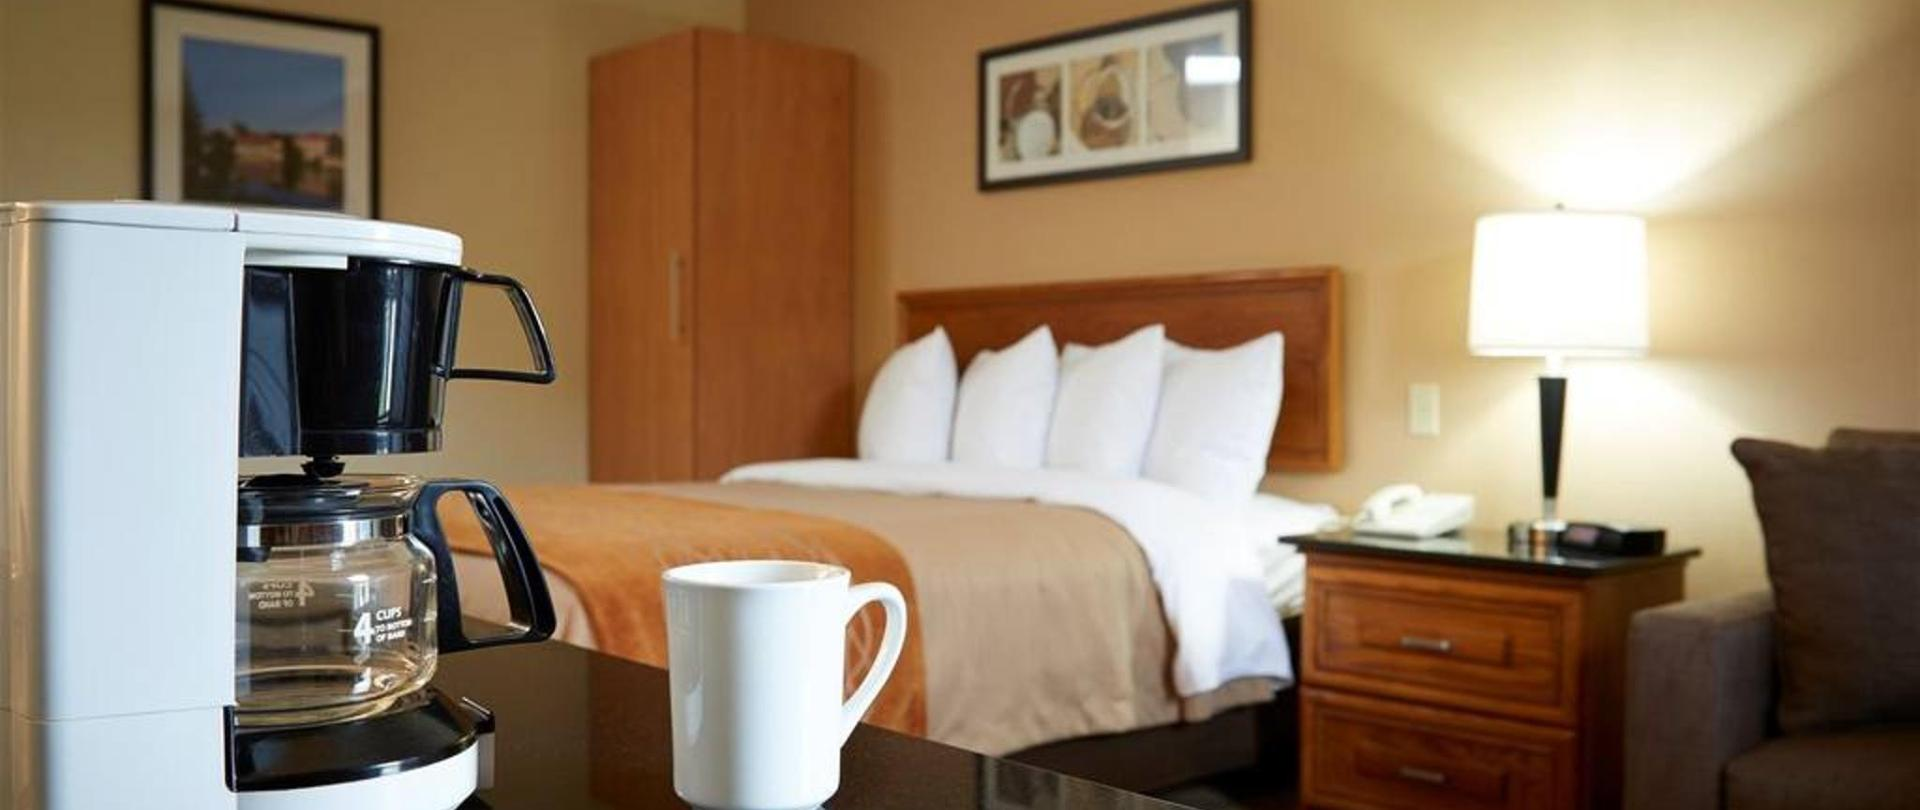 48-enjoy-fresh-in-room-coffee.jpg.1024x0.jpg